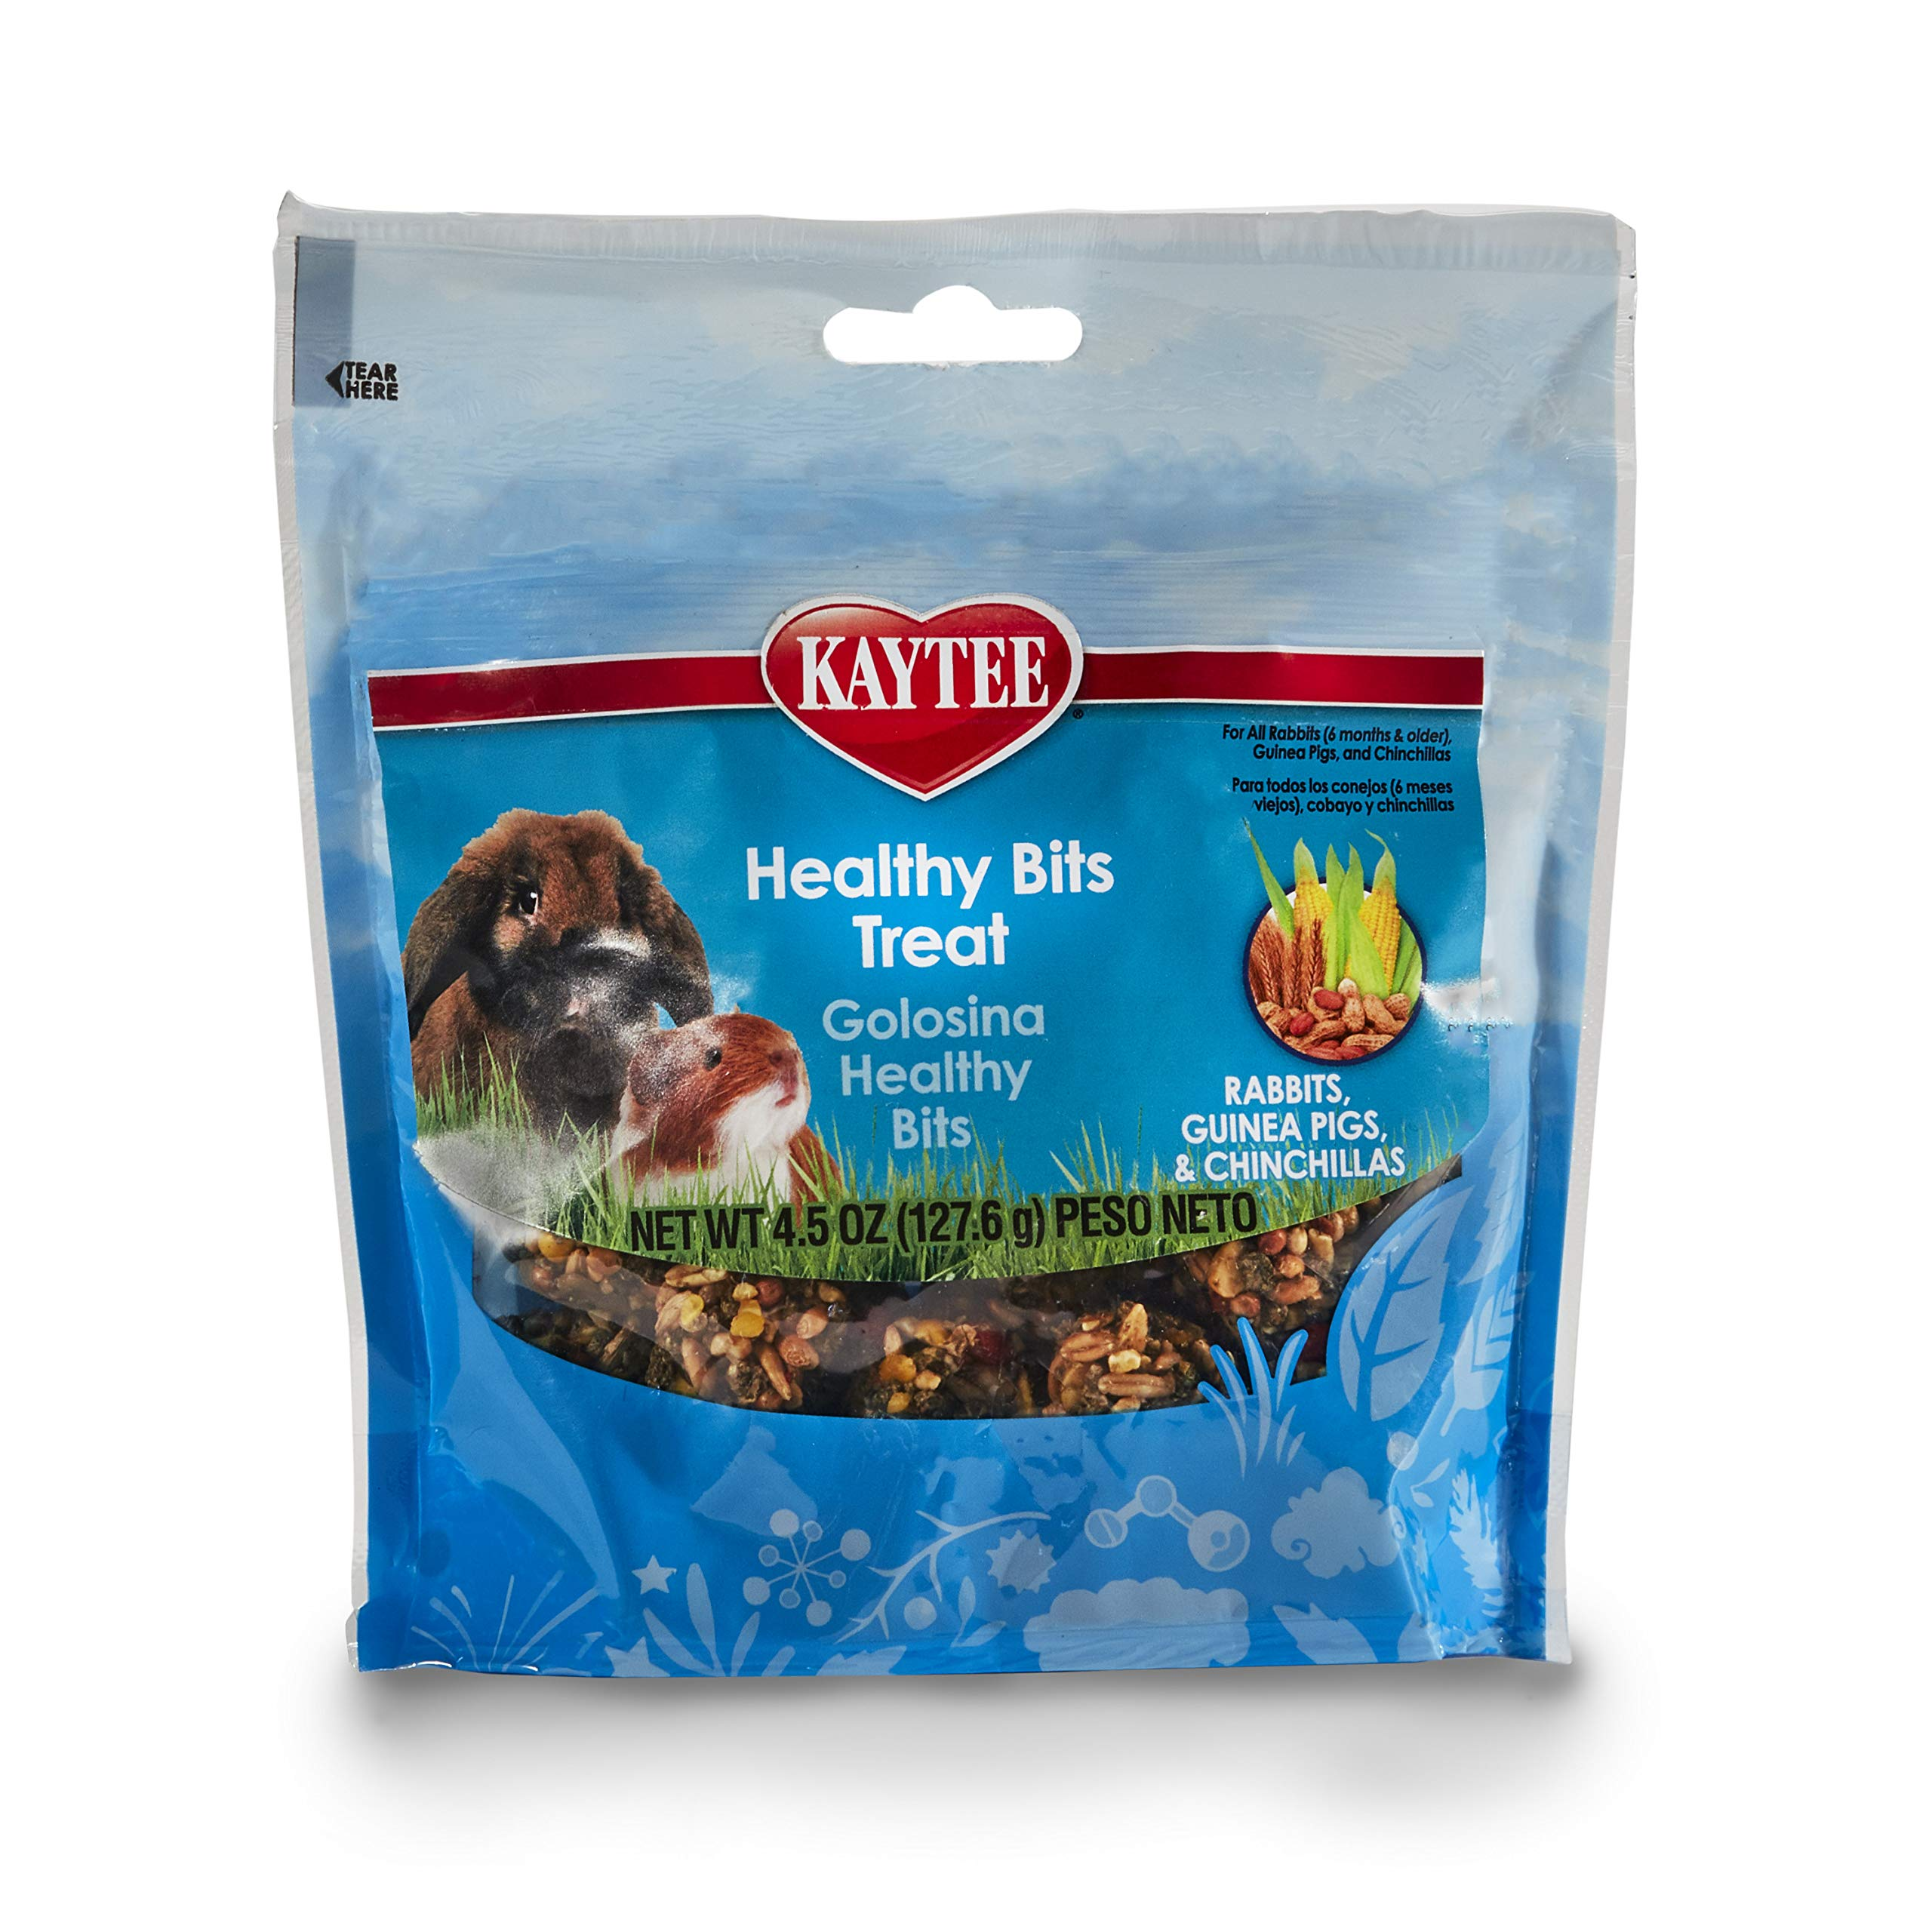 Kaytee Healthy Bits Rabbit, Guinea Pig And Chinchilla Treat,4.5 oz